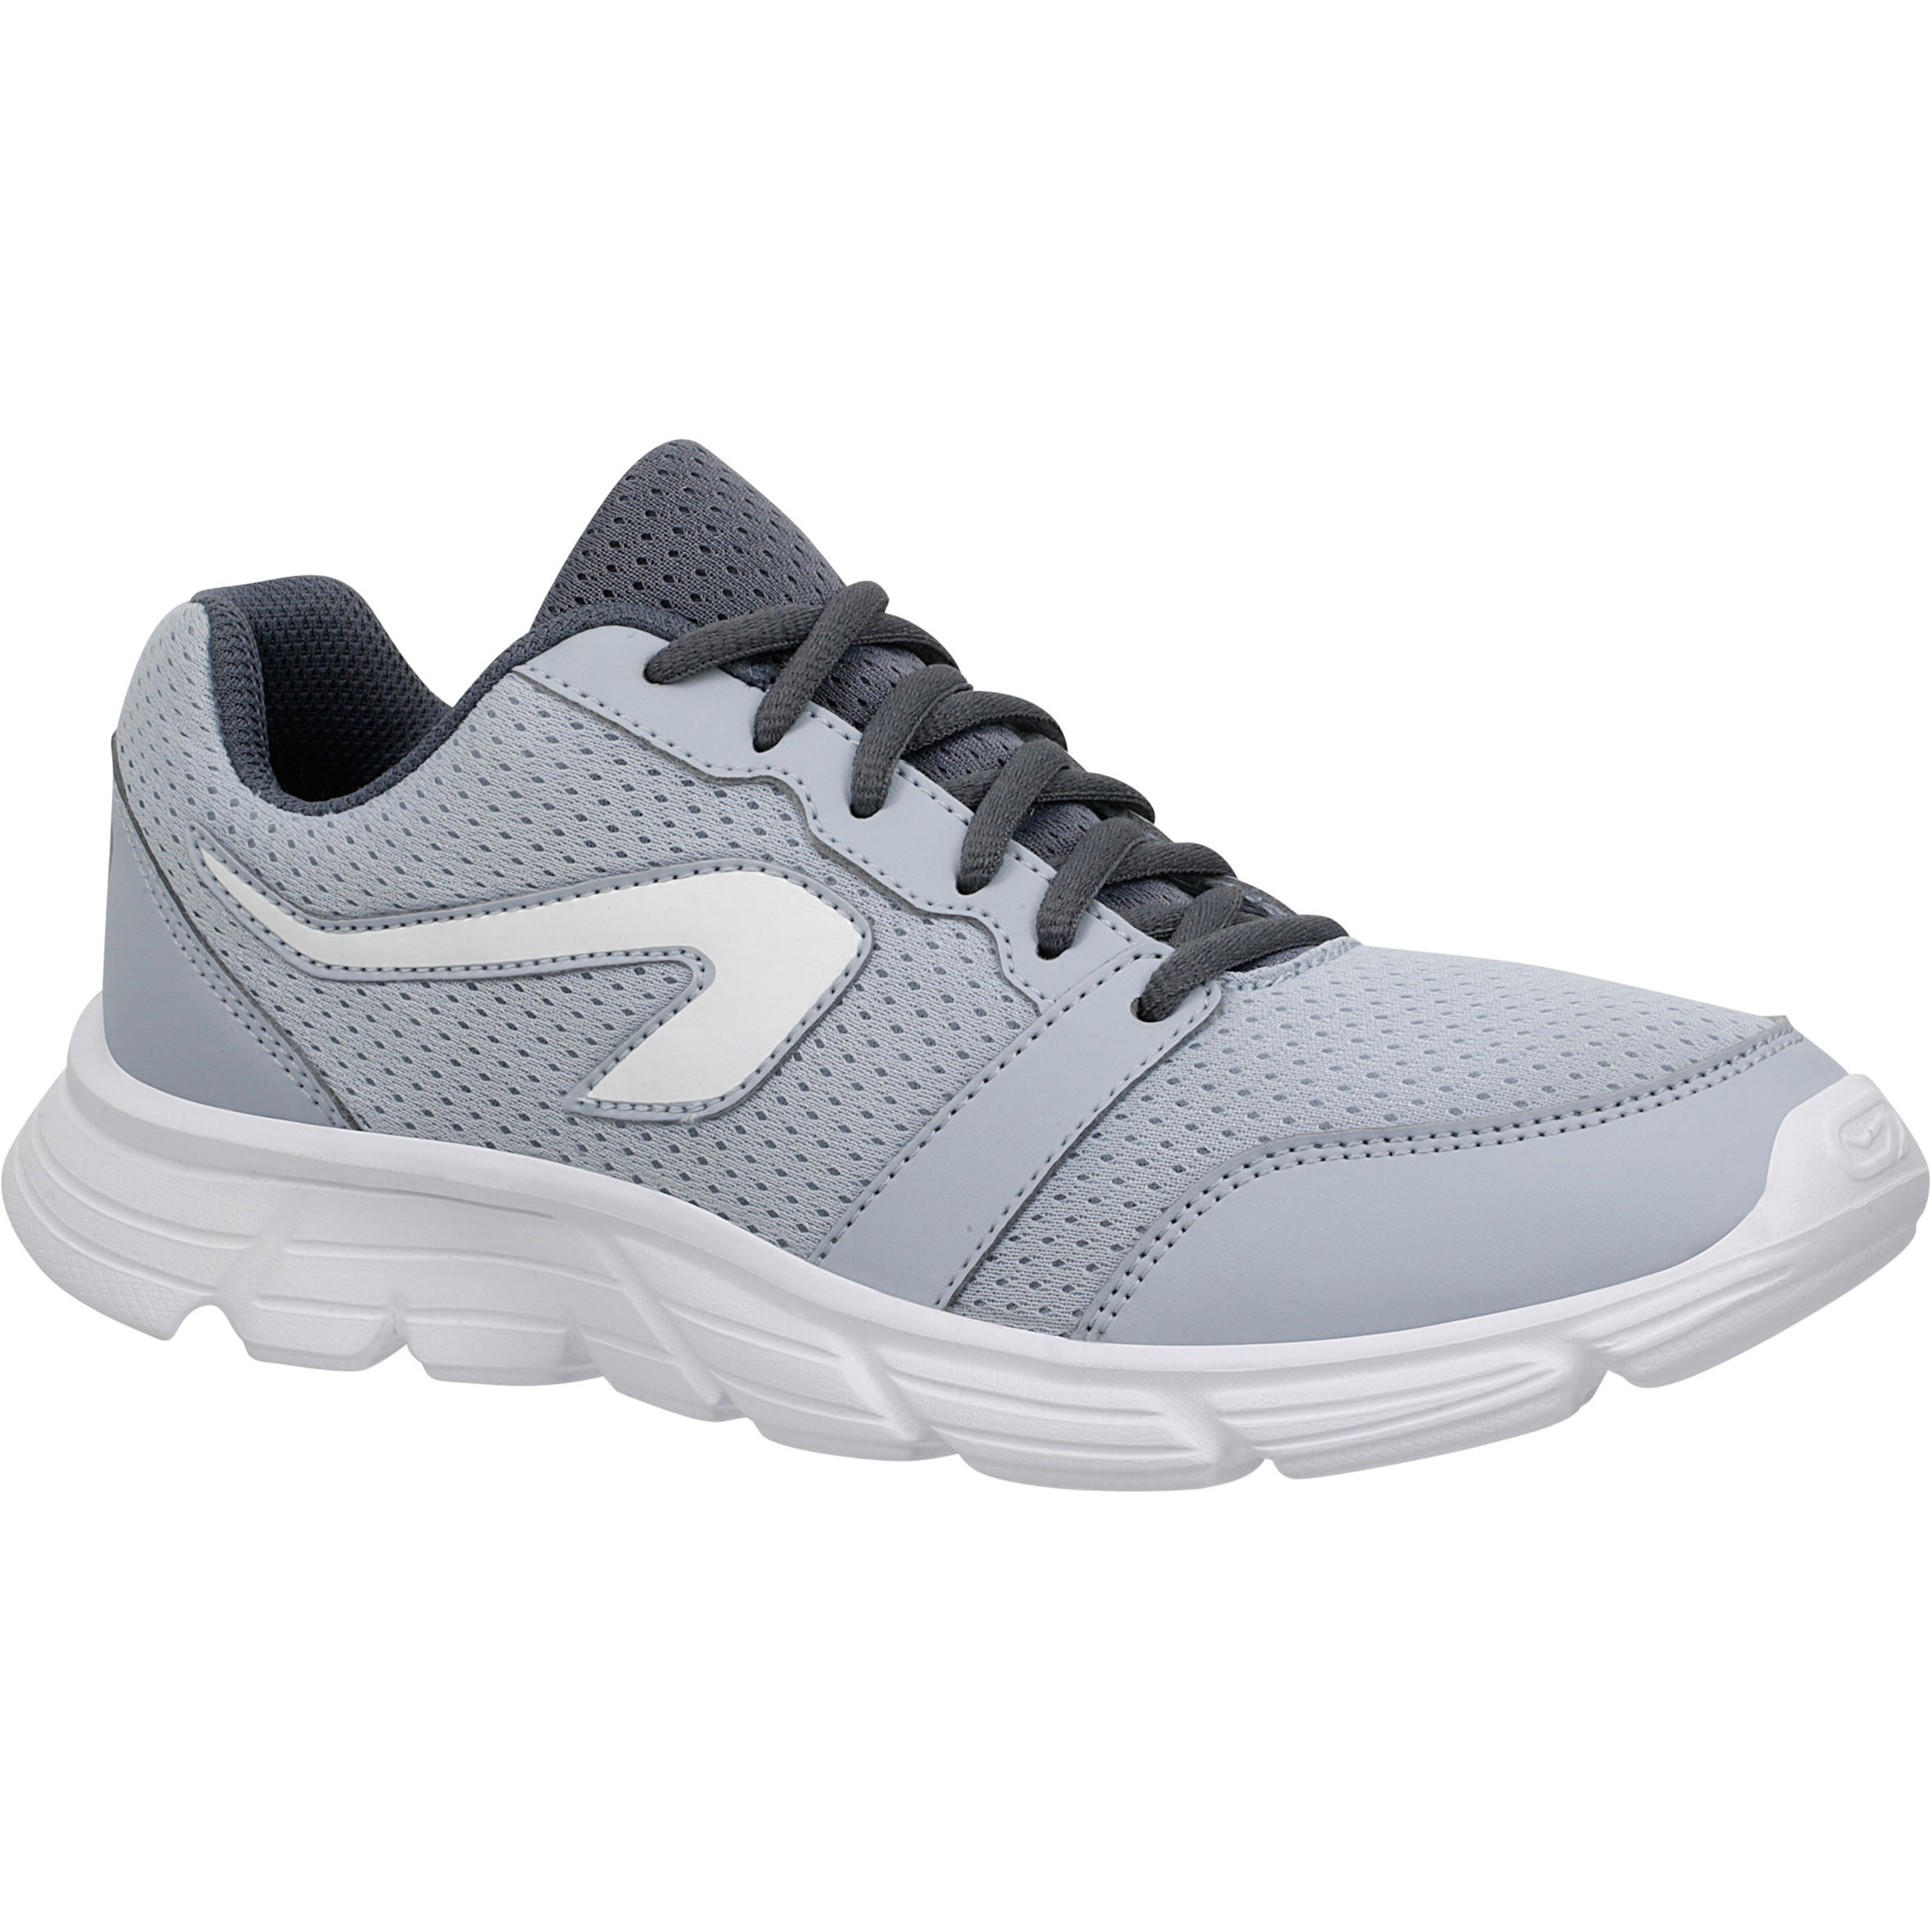 Run One Sepatu Lari Wanita - Abu-abu